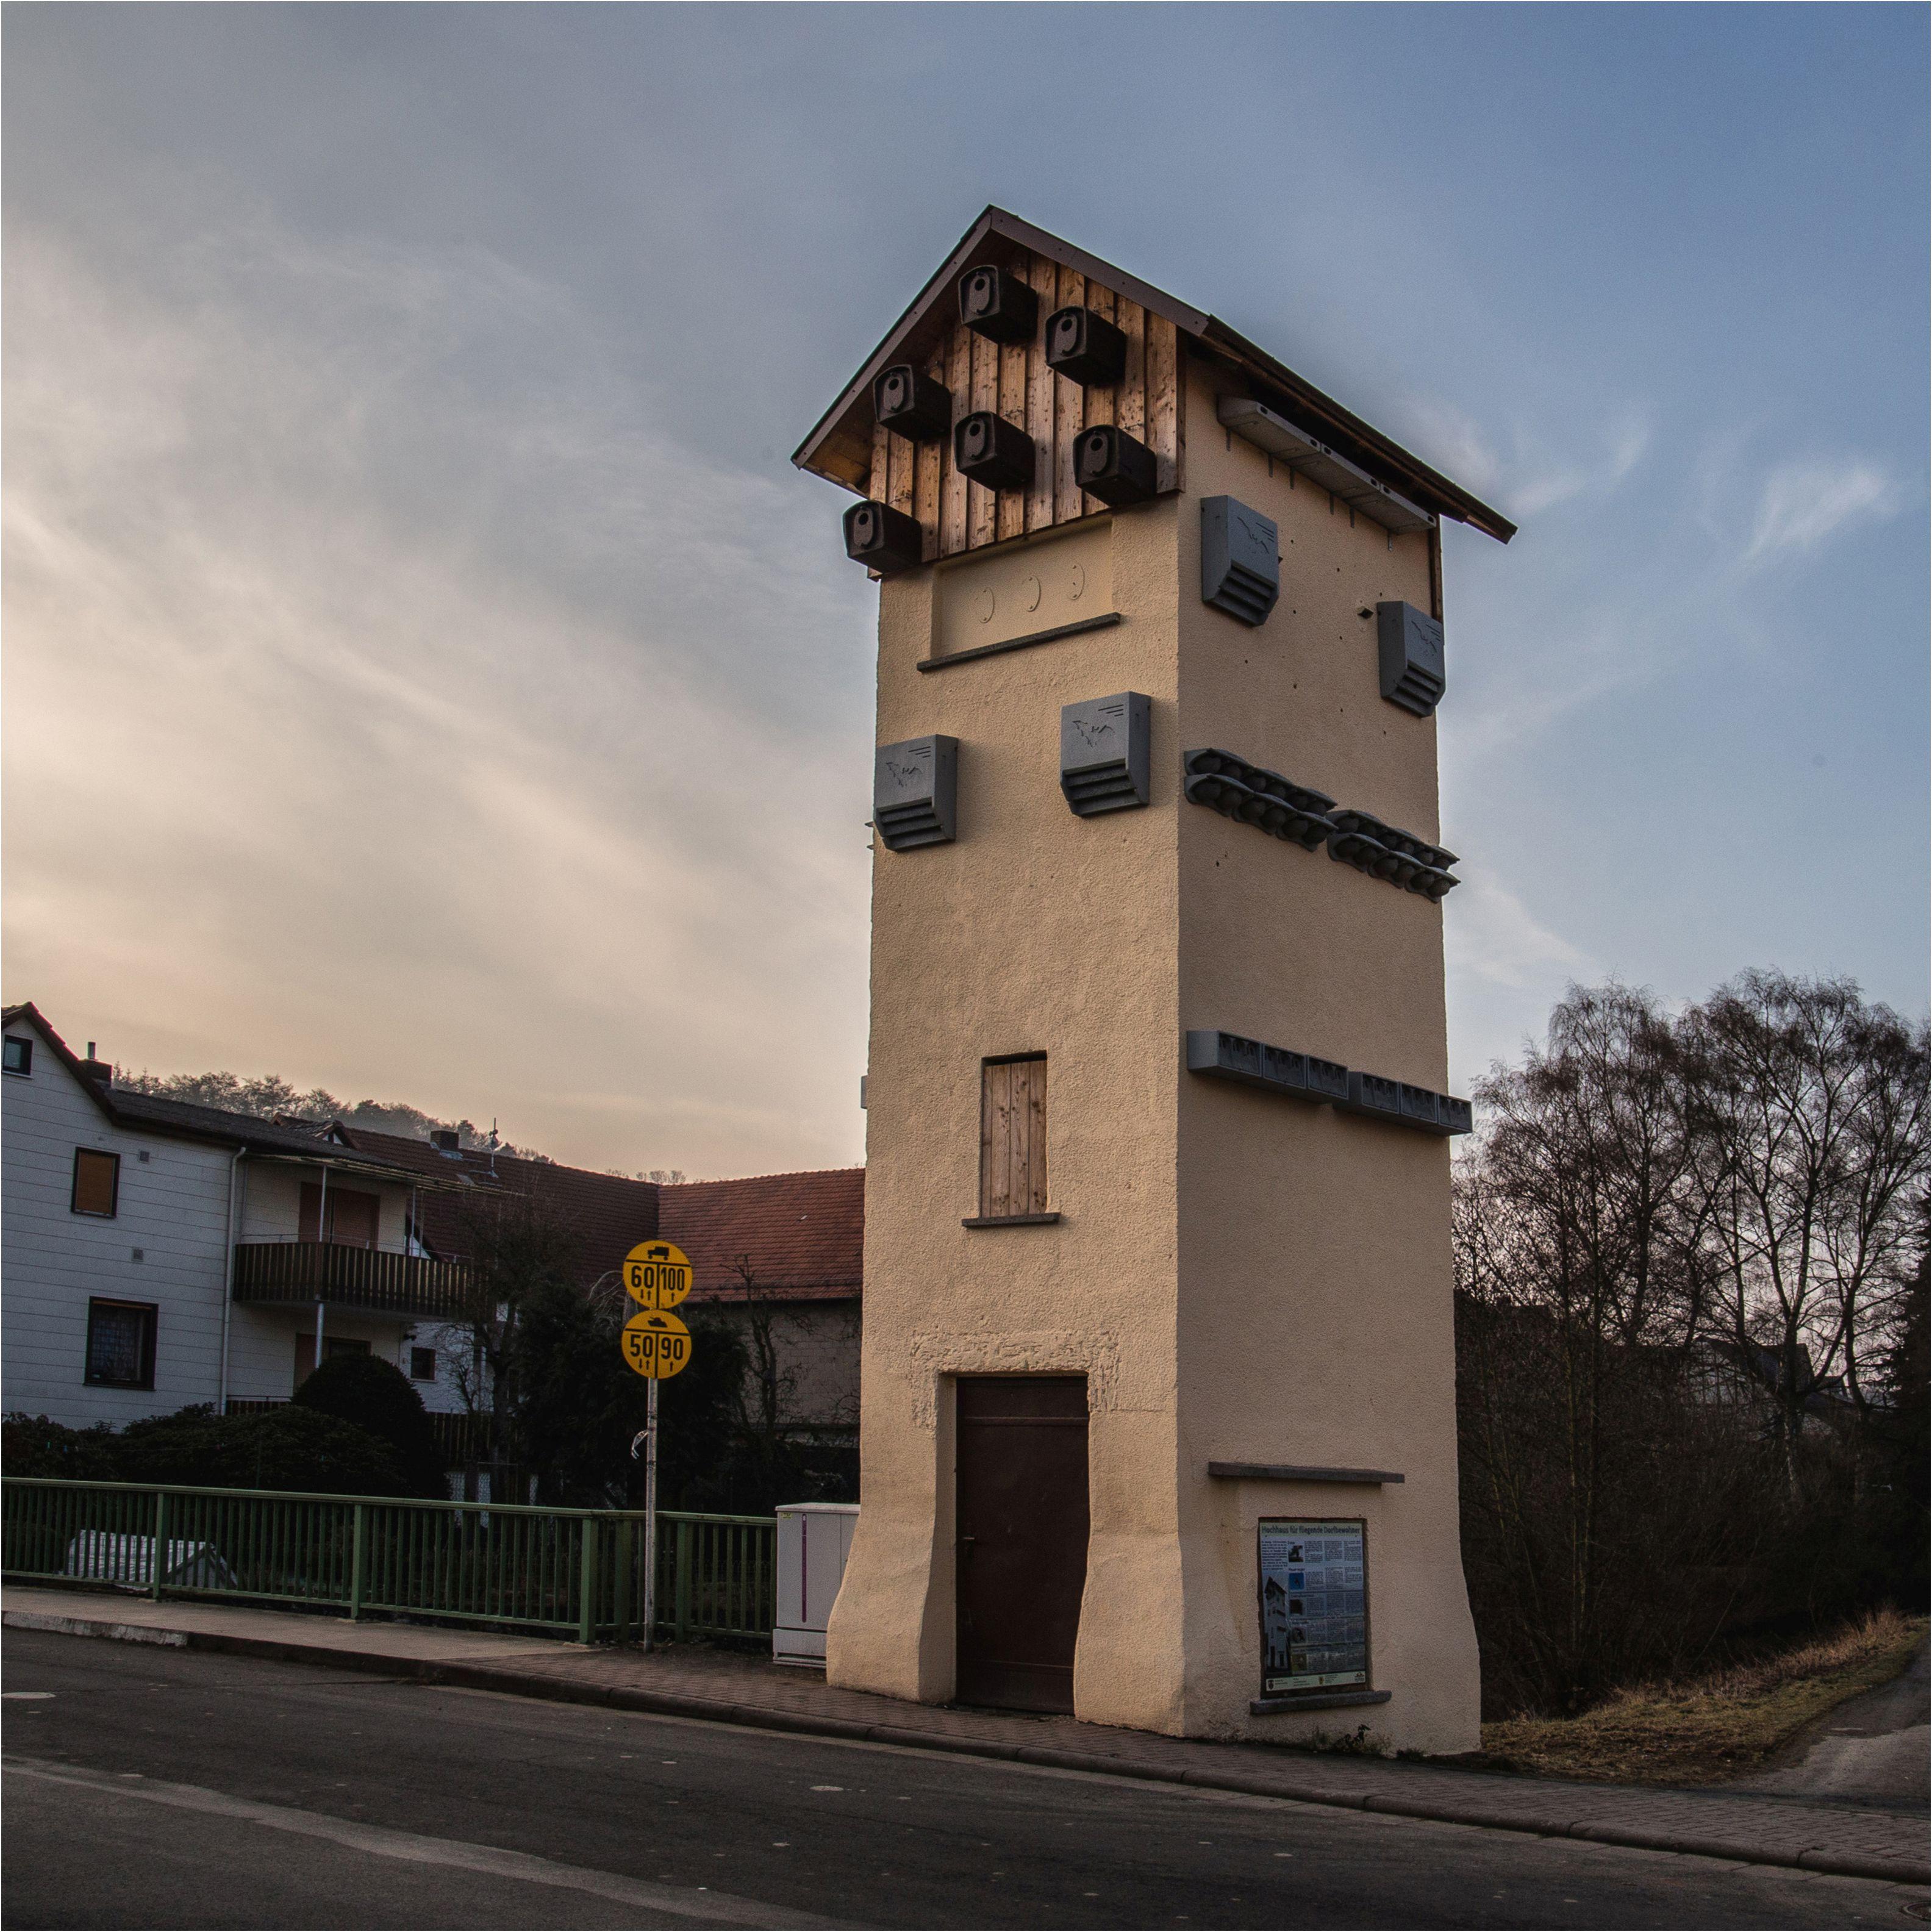 Ruhlkirchen, ehemalige Trafostation, Fledermaushotel